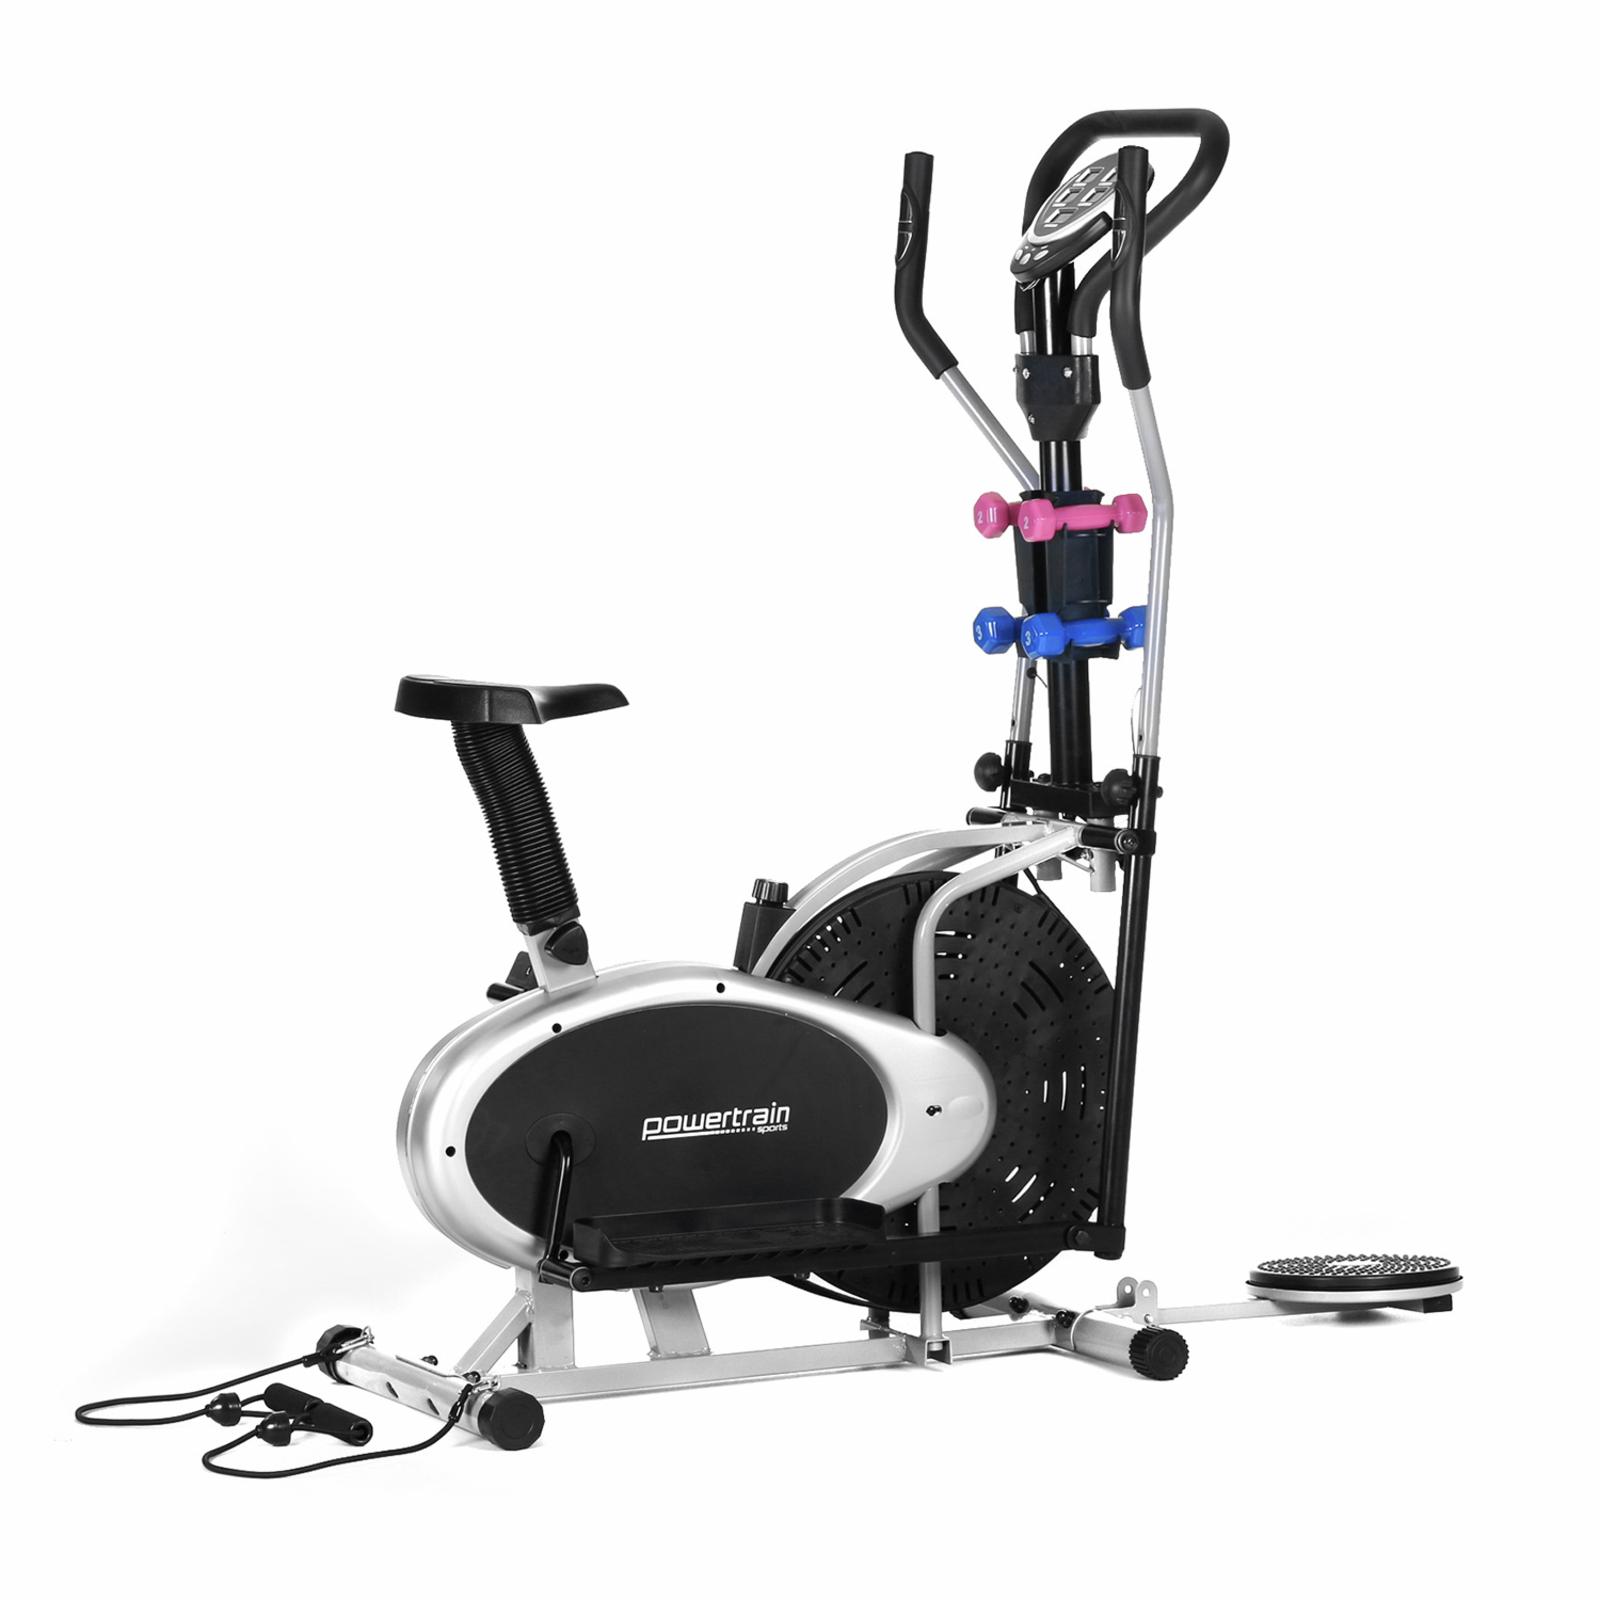 PowerTrain Elliptical Cross Trainer Exercise Bike With Dumbbells & Resistance Bands